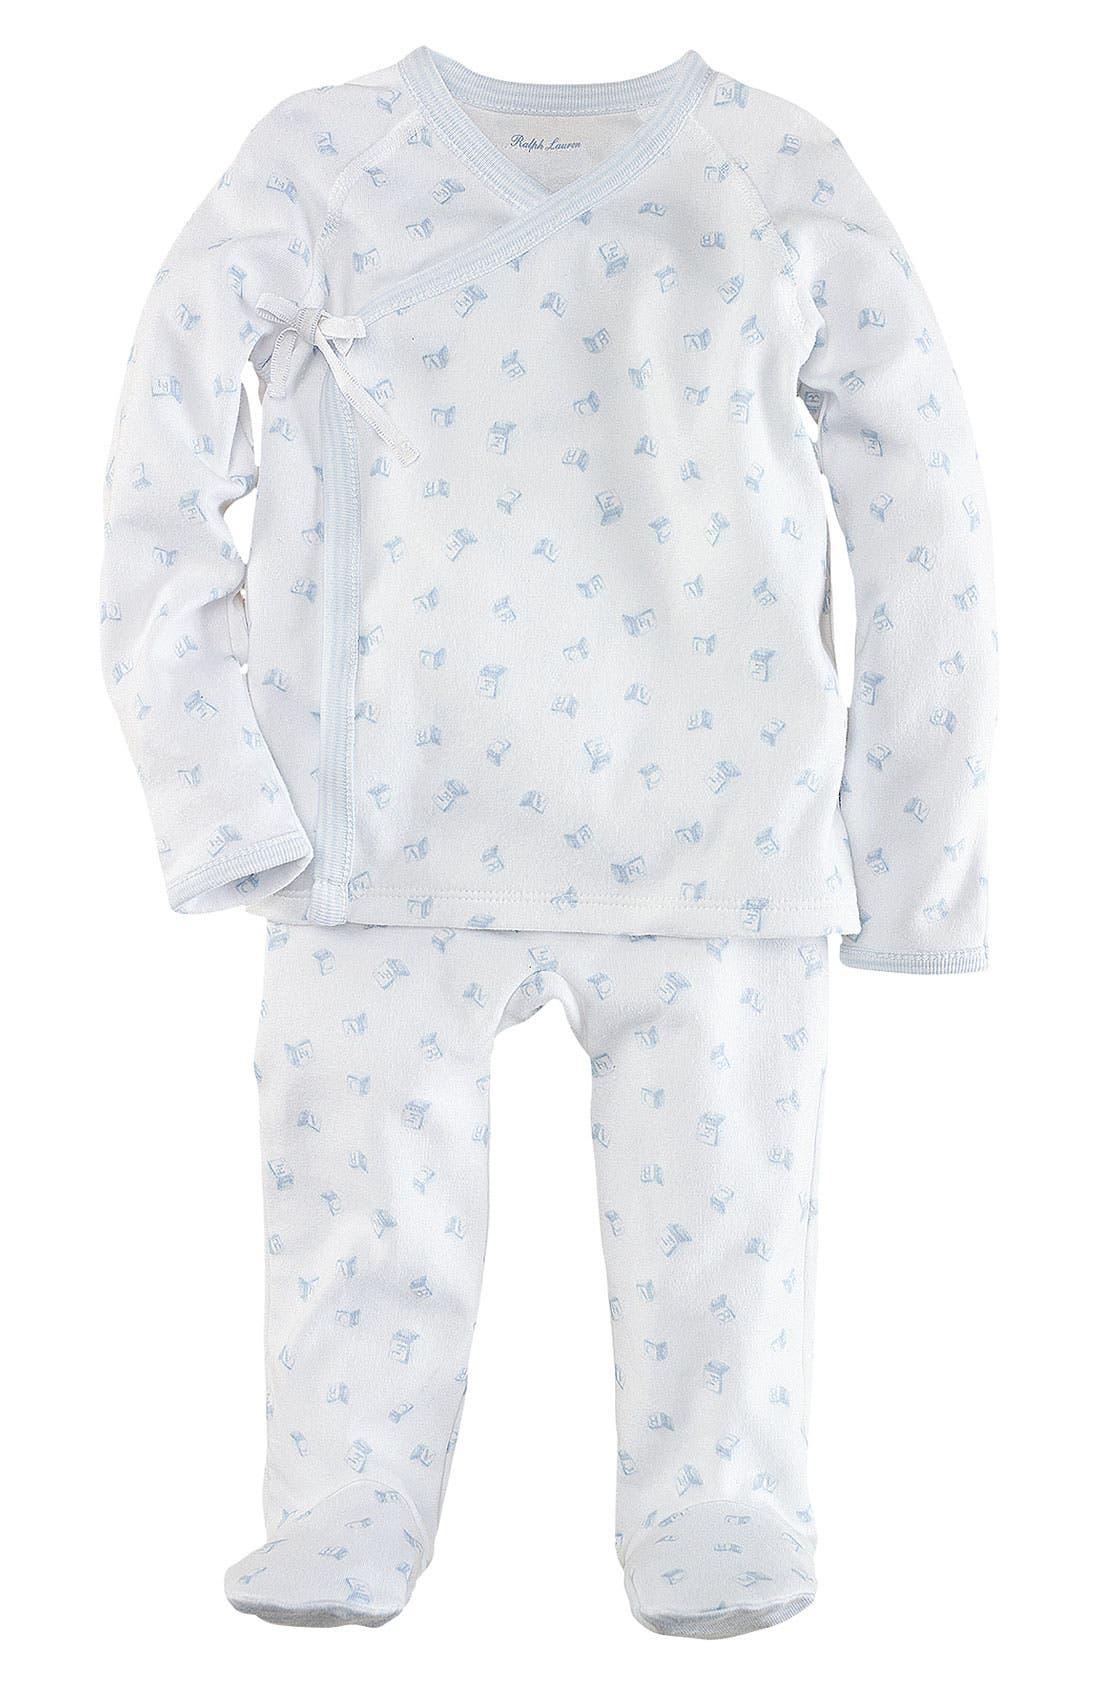 Alternate Image 1 Selected - Ralph Lauren Top & Footed Leggings (Infant)